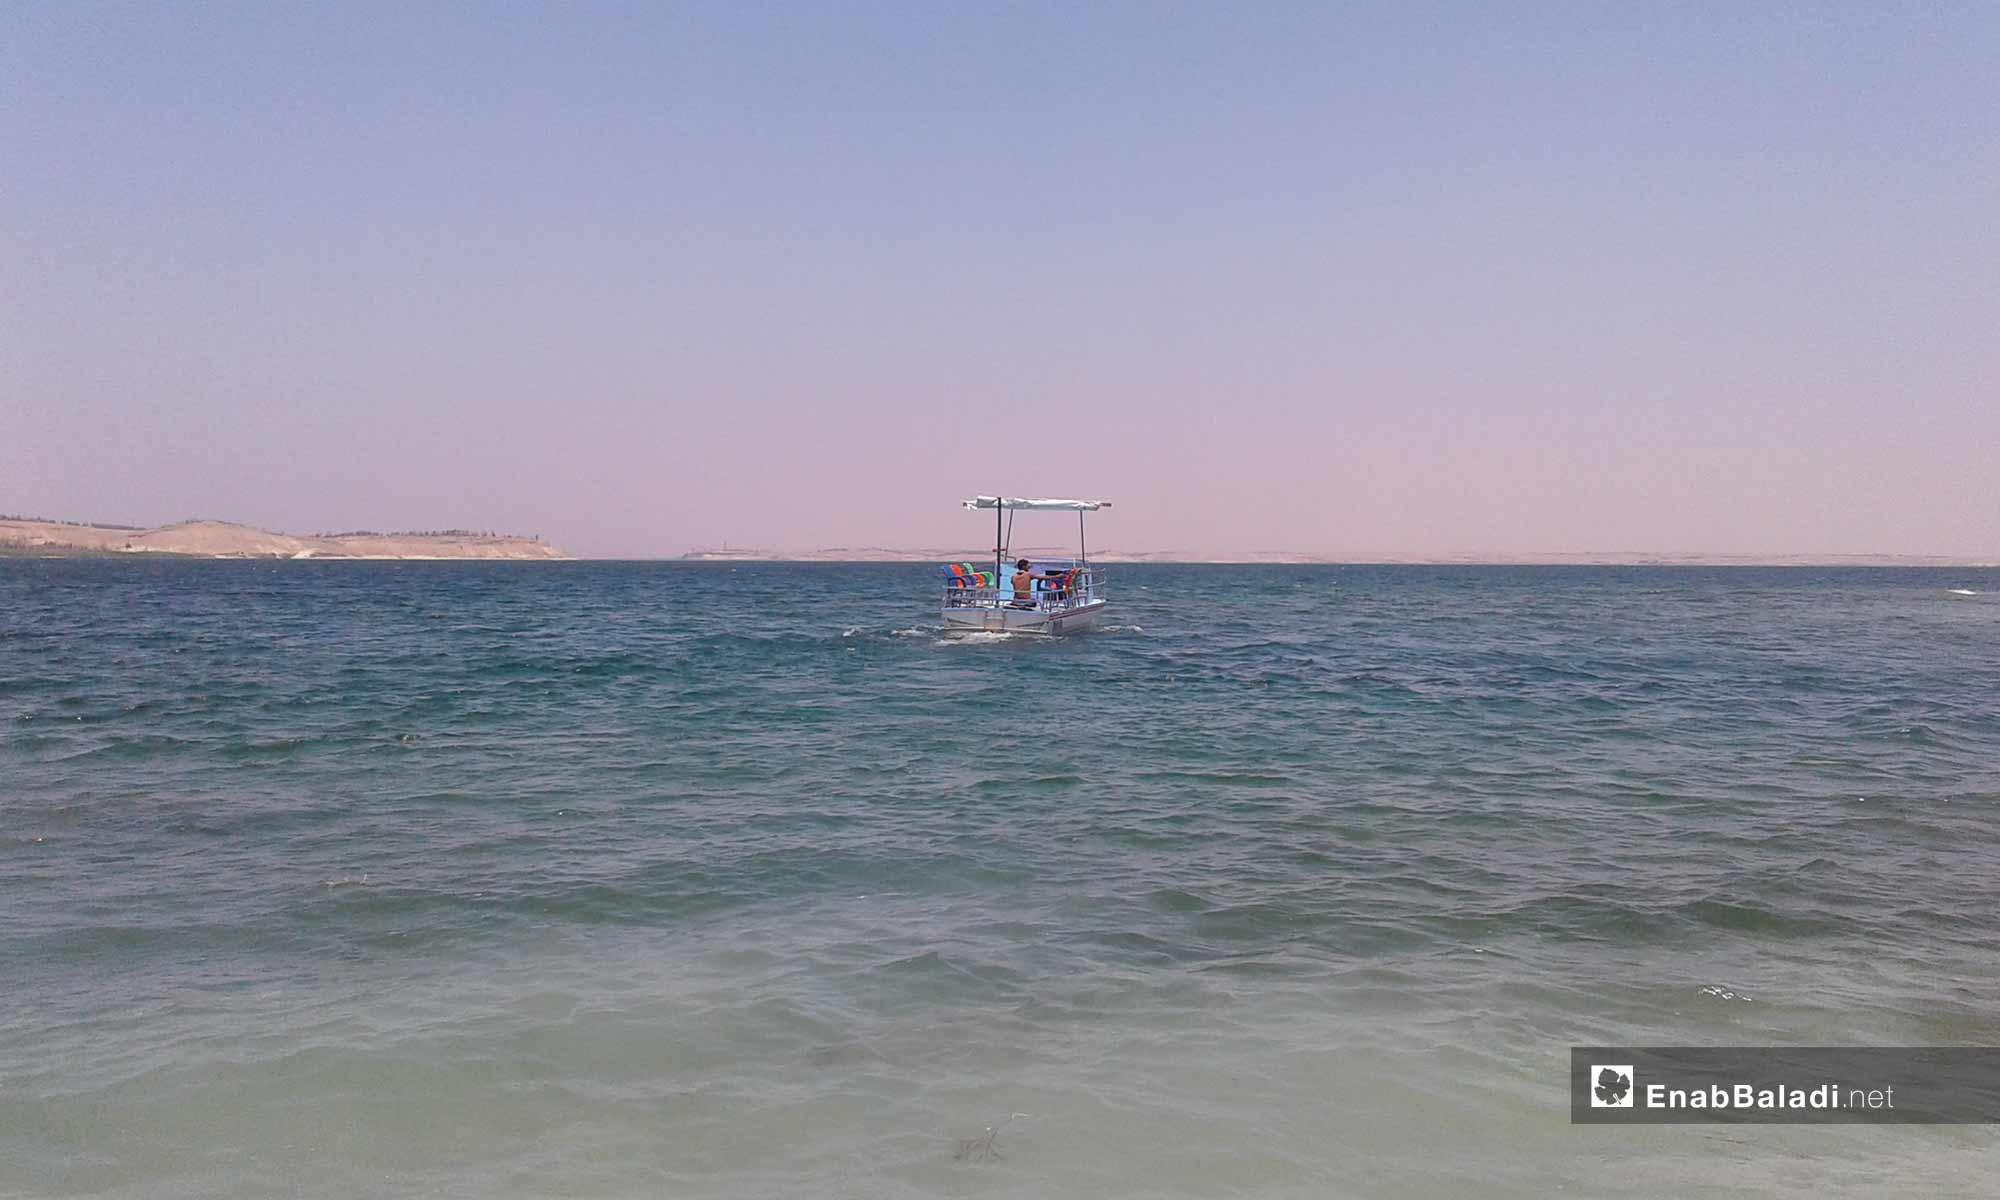 Al-Tabqah Lake, Raqqa Governorate – August 13, 2018 (Enab Baladi)